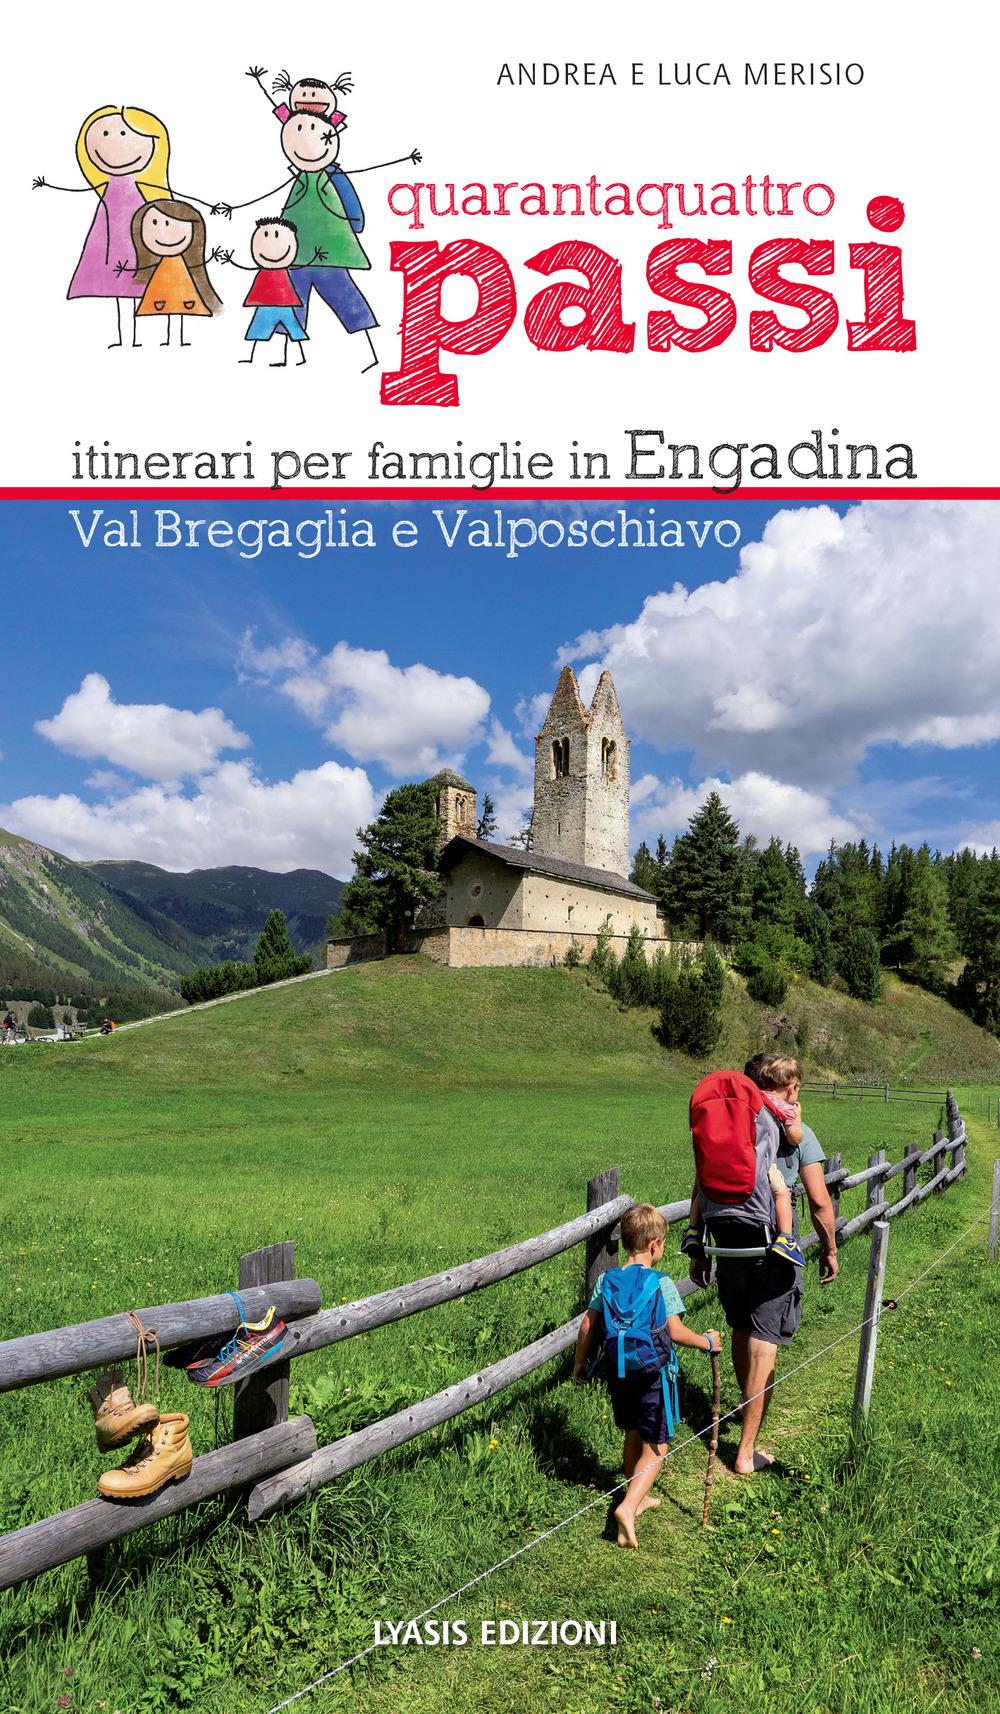 44 passi. Itinerari per famiglie in Engadina, val Bregaglia, Valposchiavo